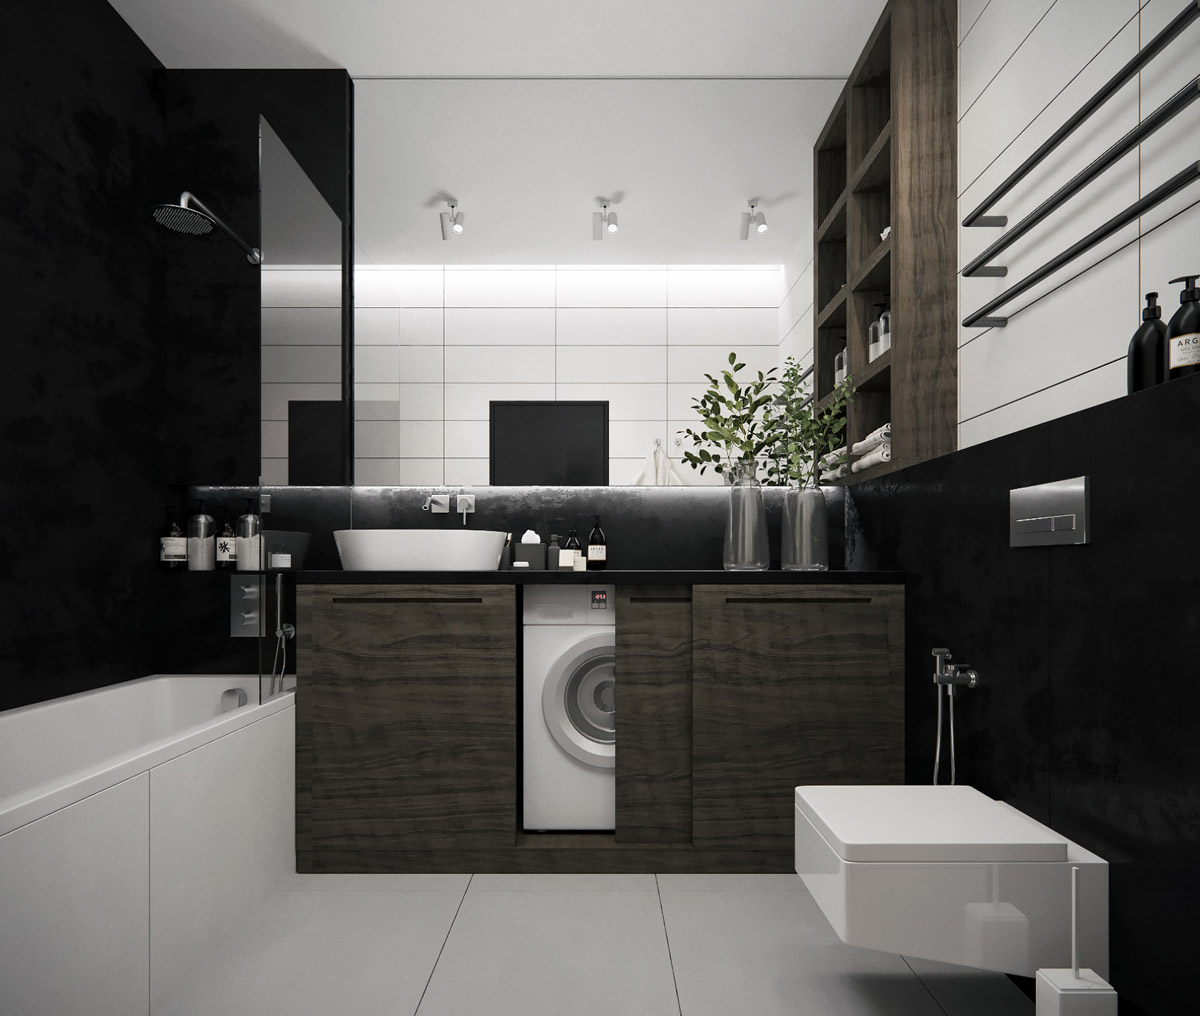 salle de bain minimaliste machine a laver